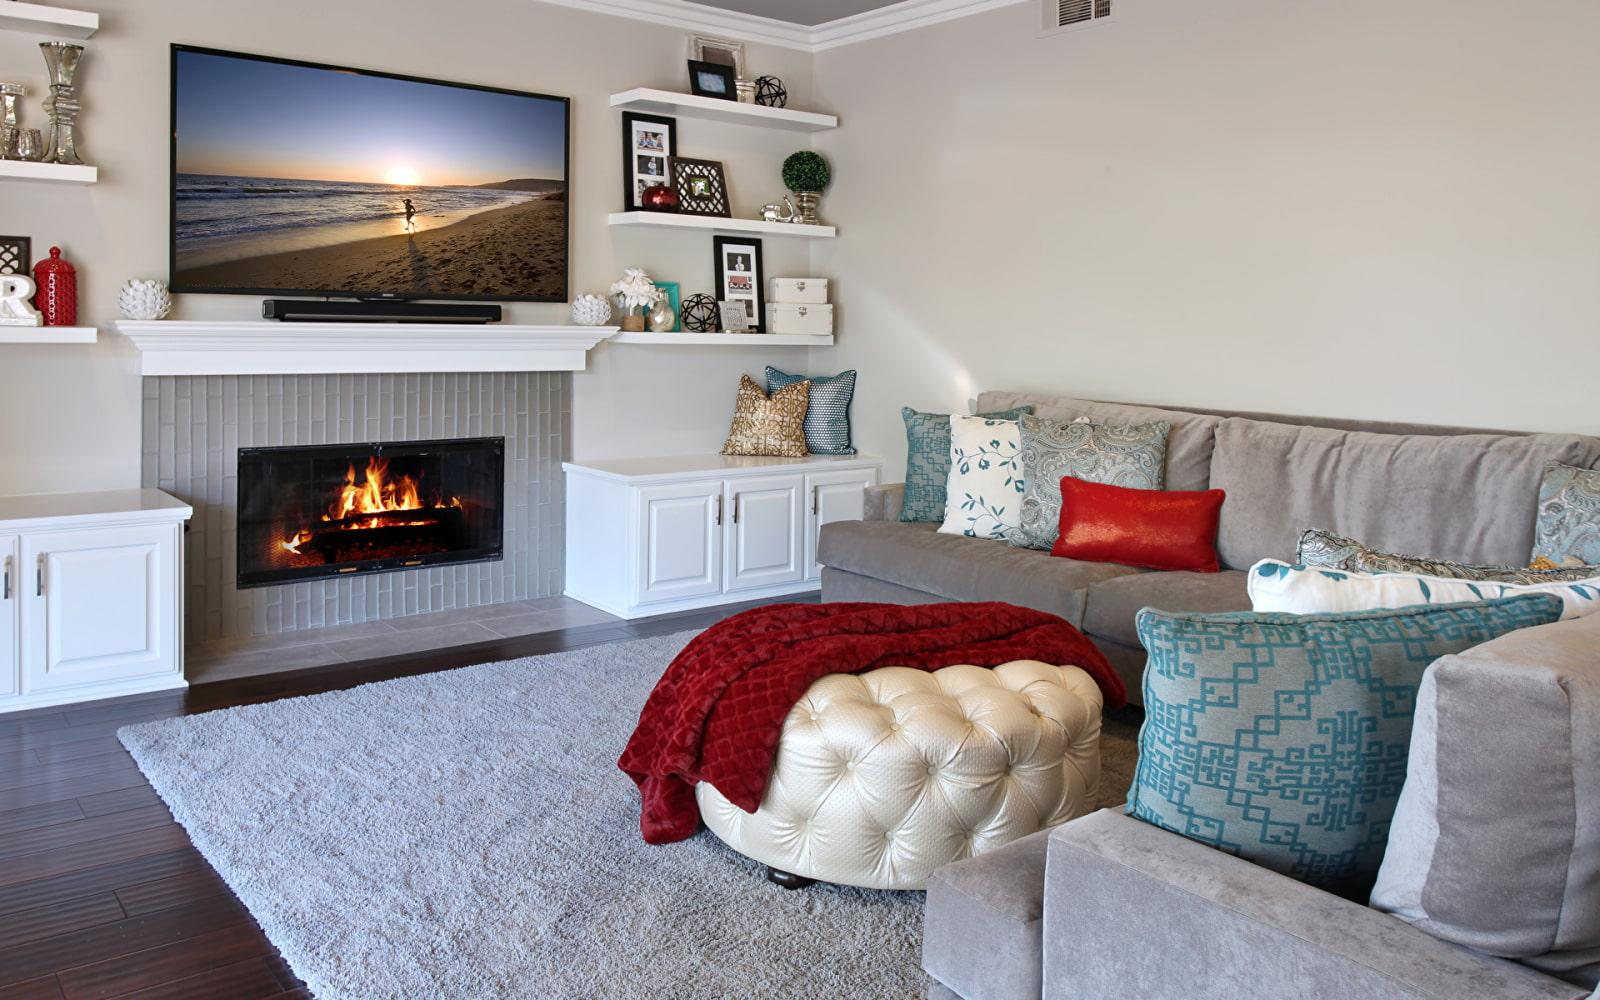 Картинка диван с телевизором